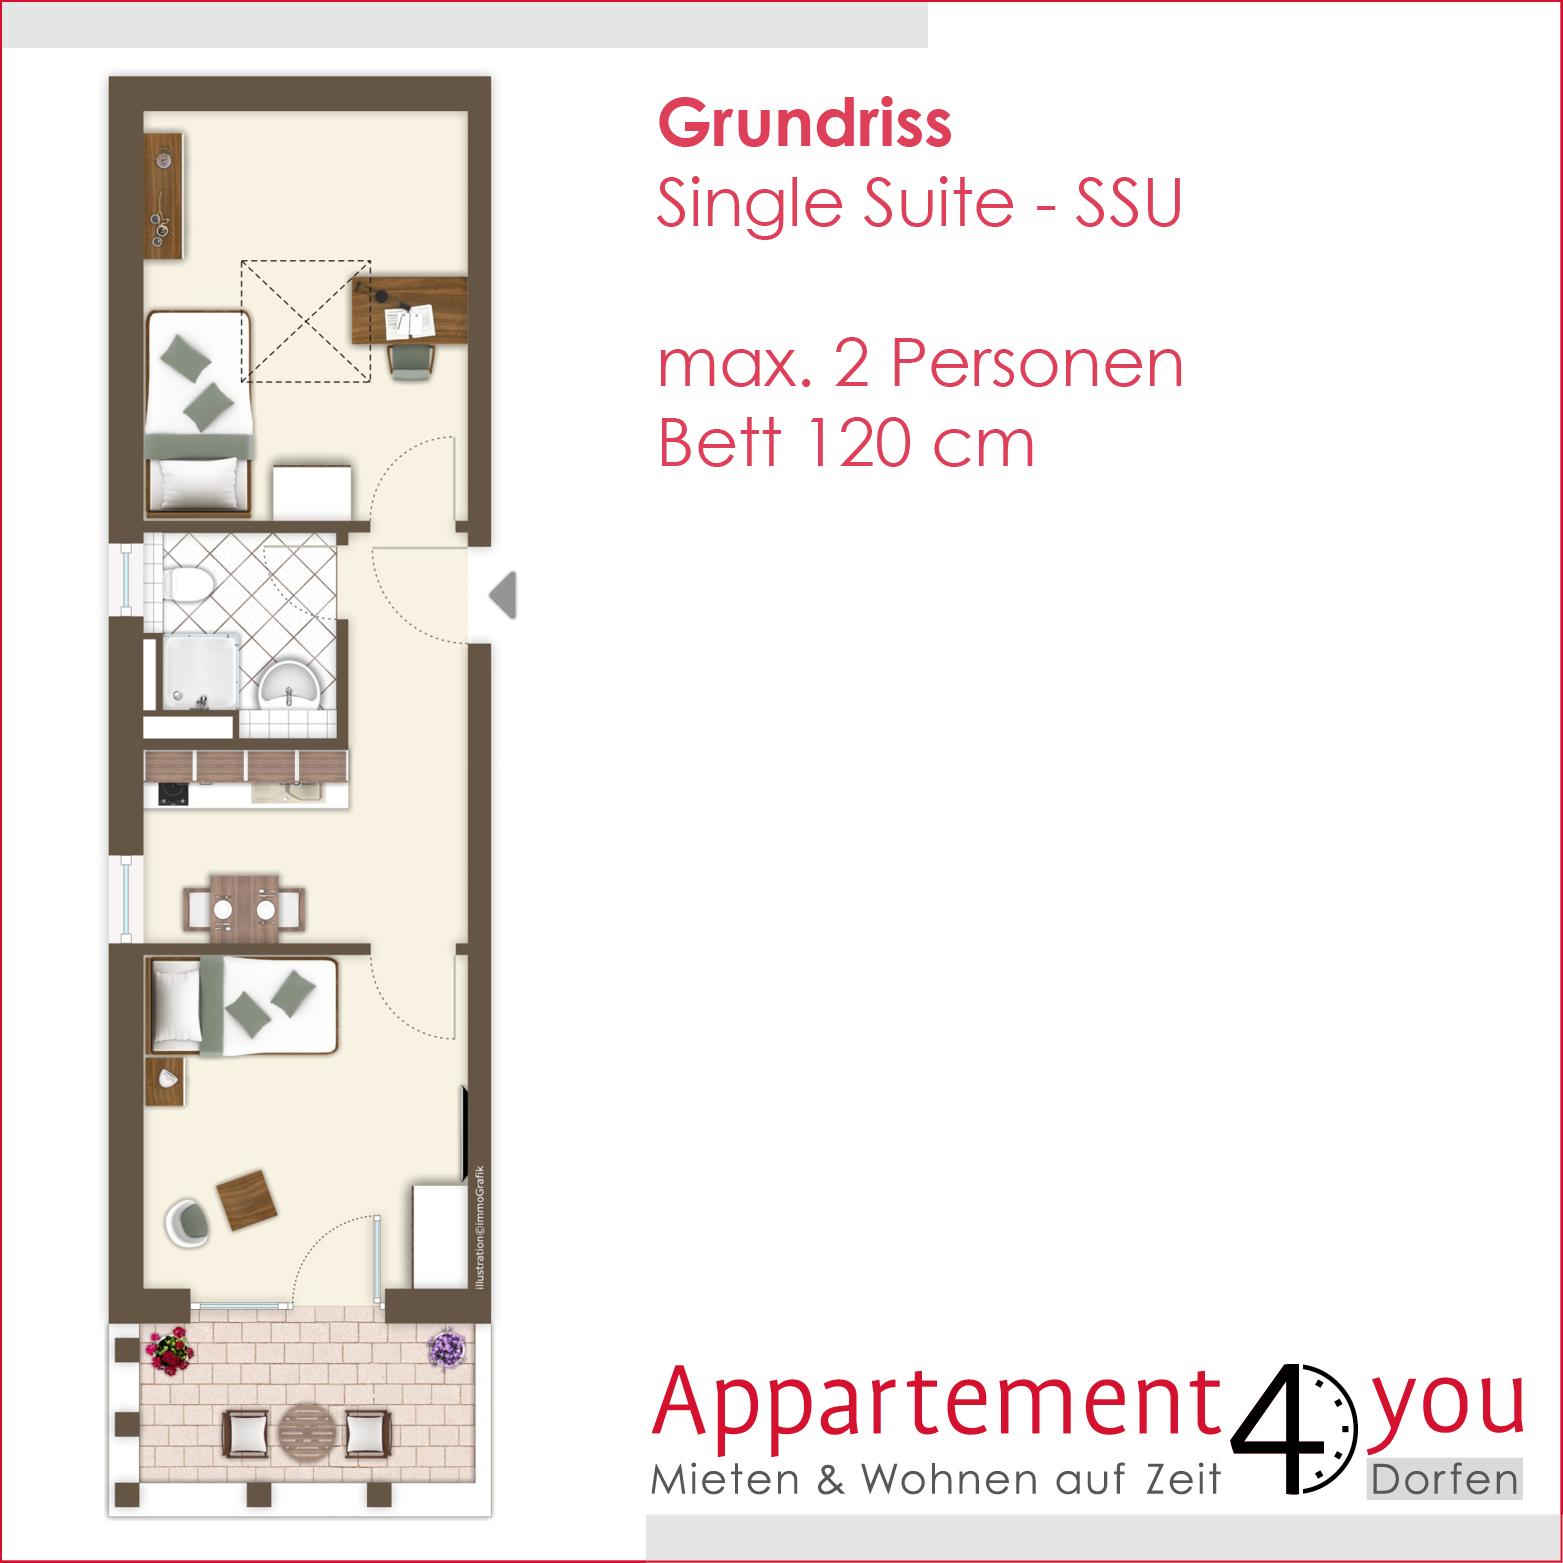 single suite | real estate services gmbh, Hause deko